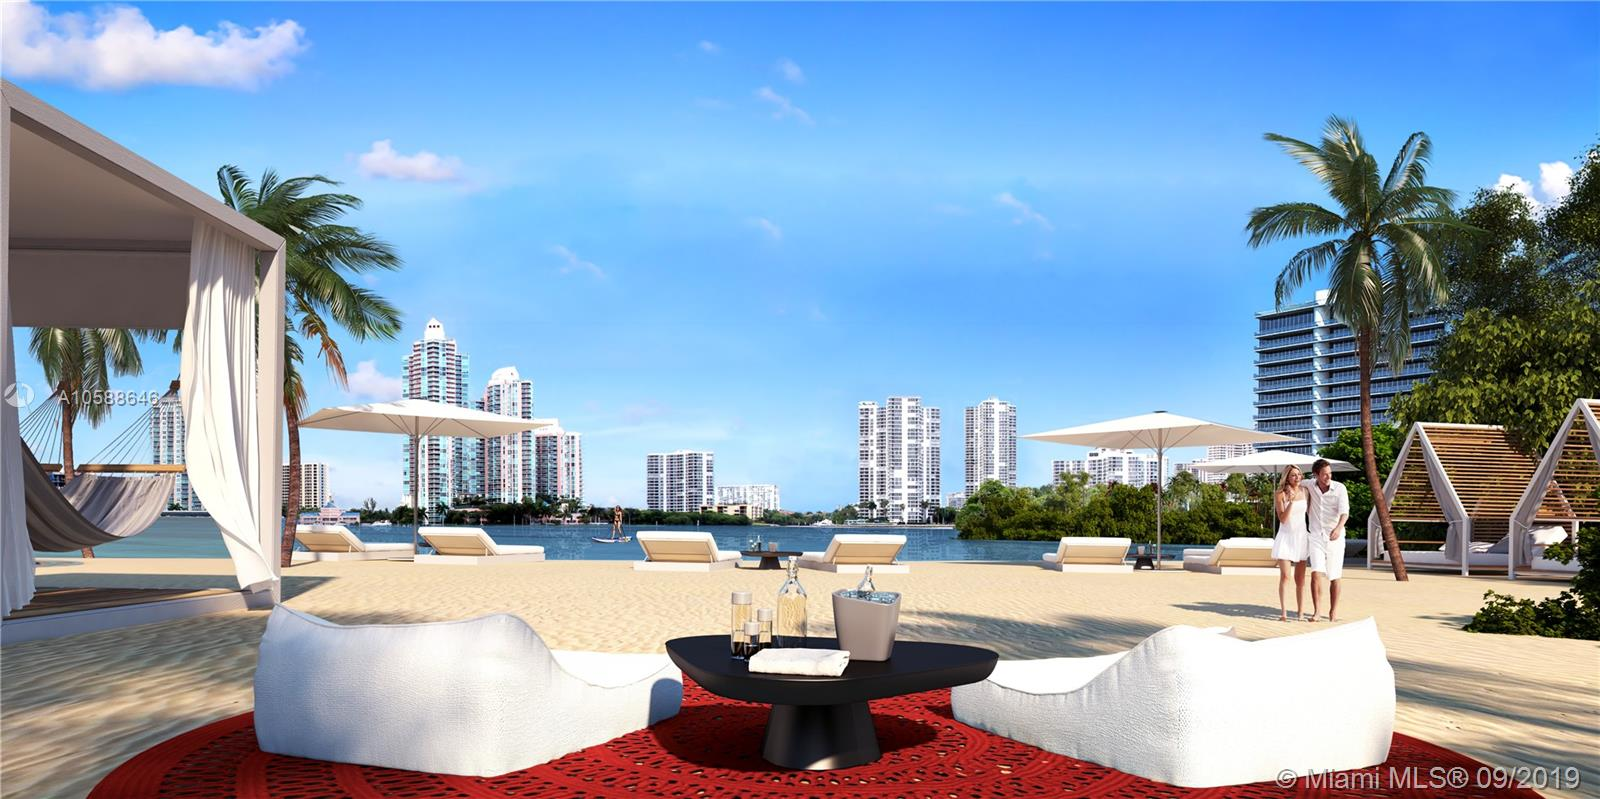 5000 Island estates drive-PH B aventura-fl-33160-a10588646-Pic02